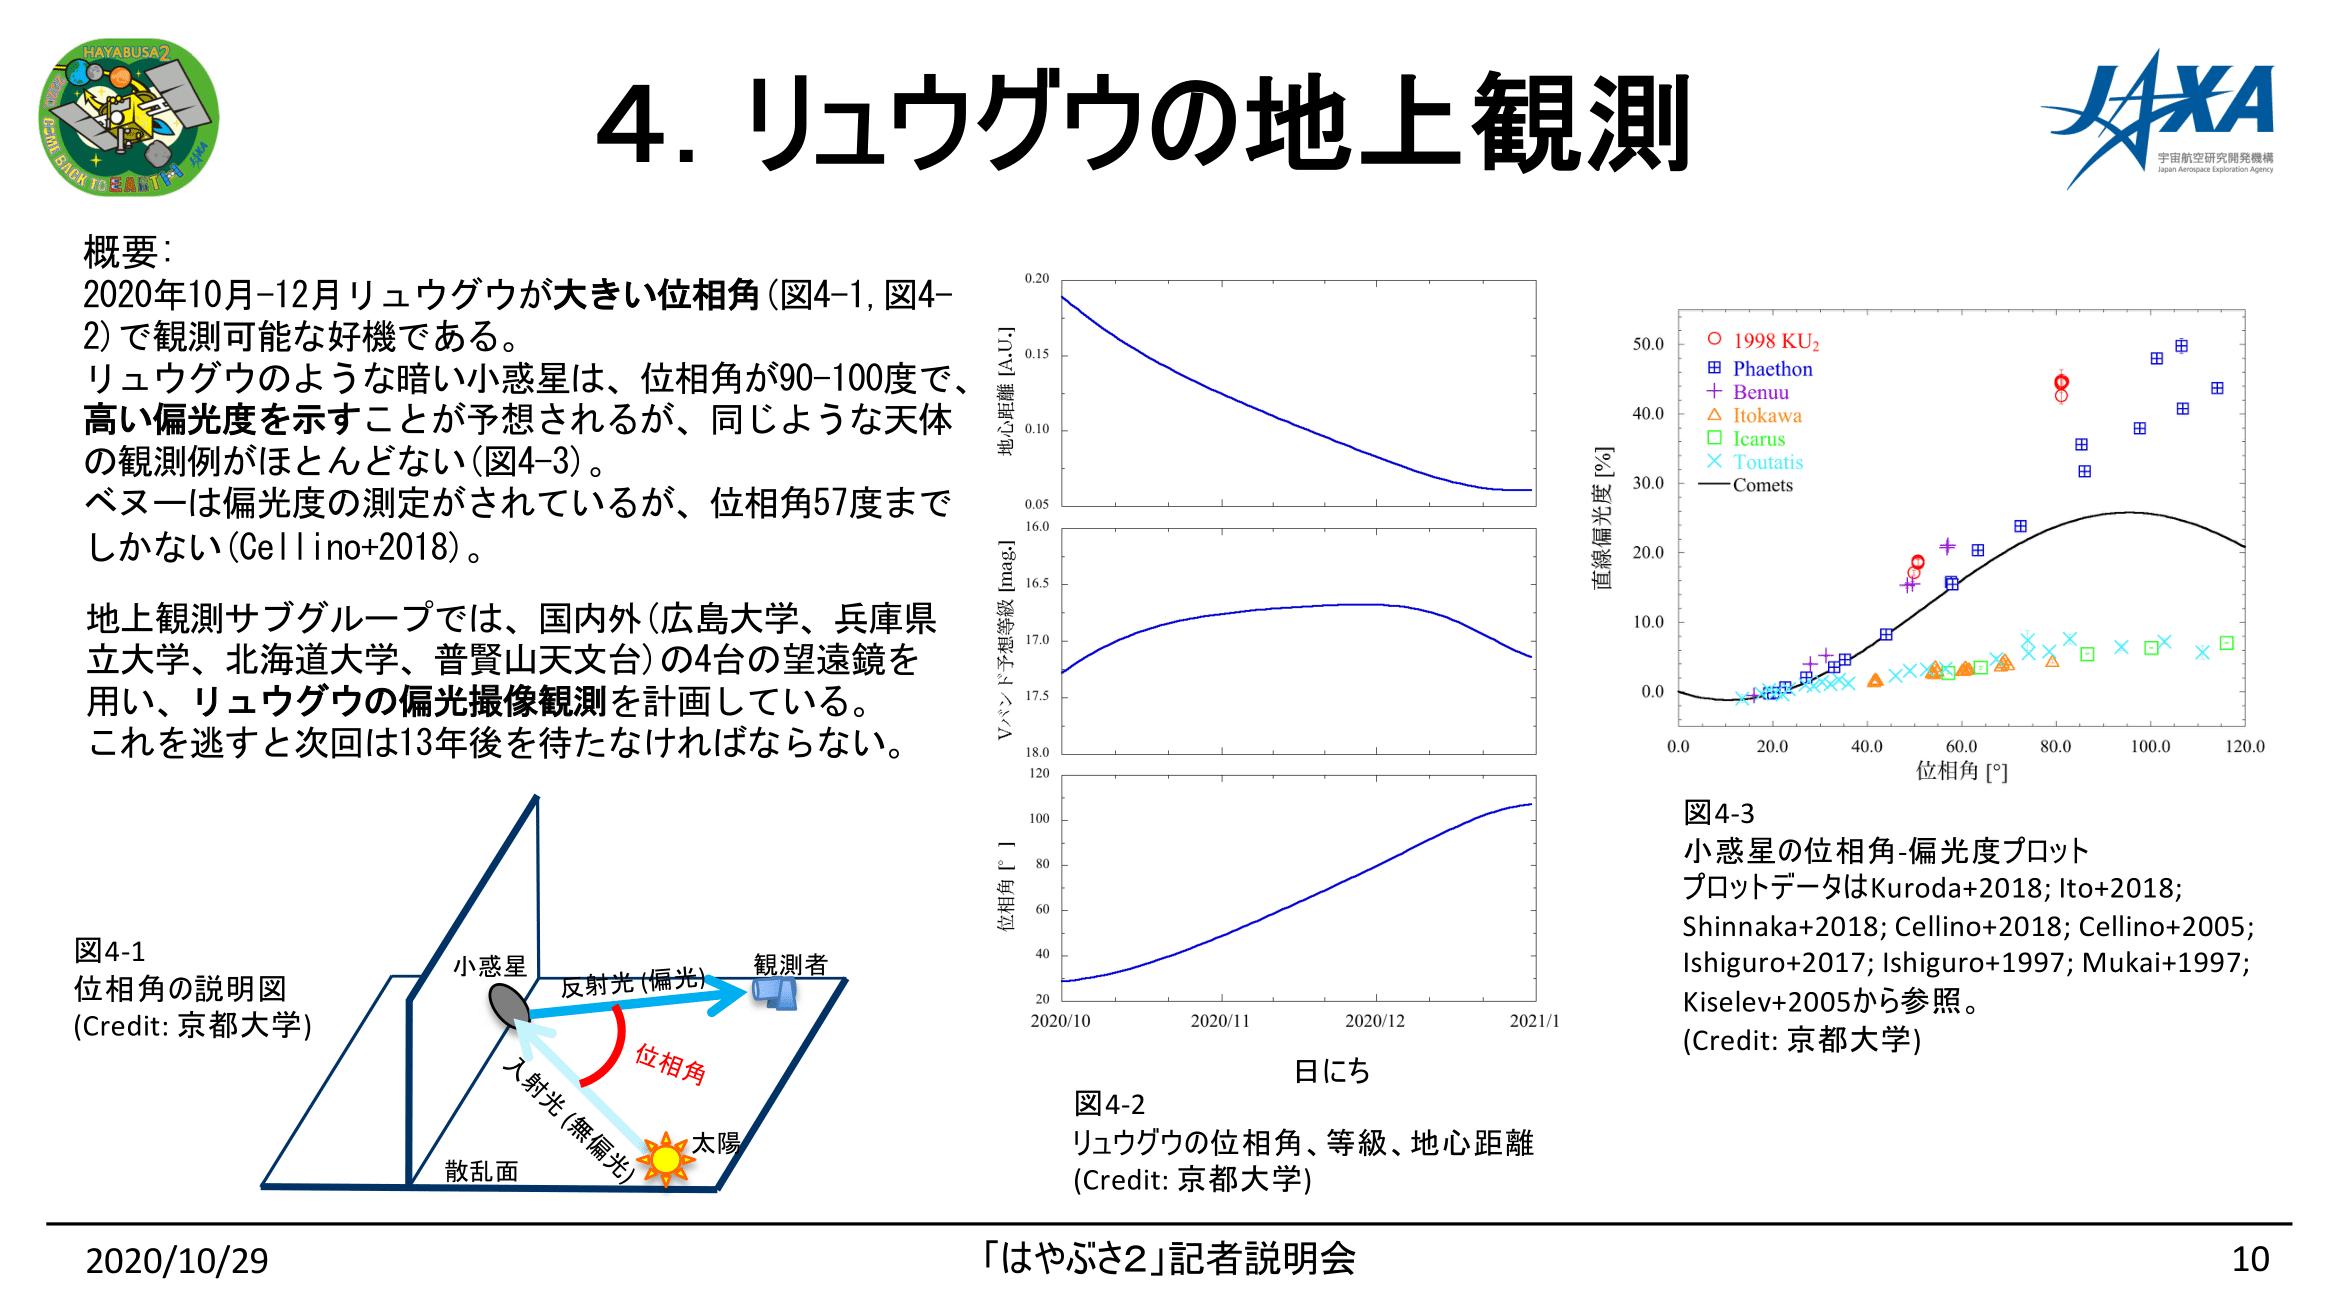 f:id:Imamura:20201029161321p:plain